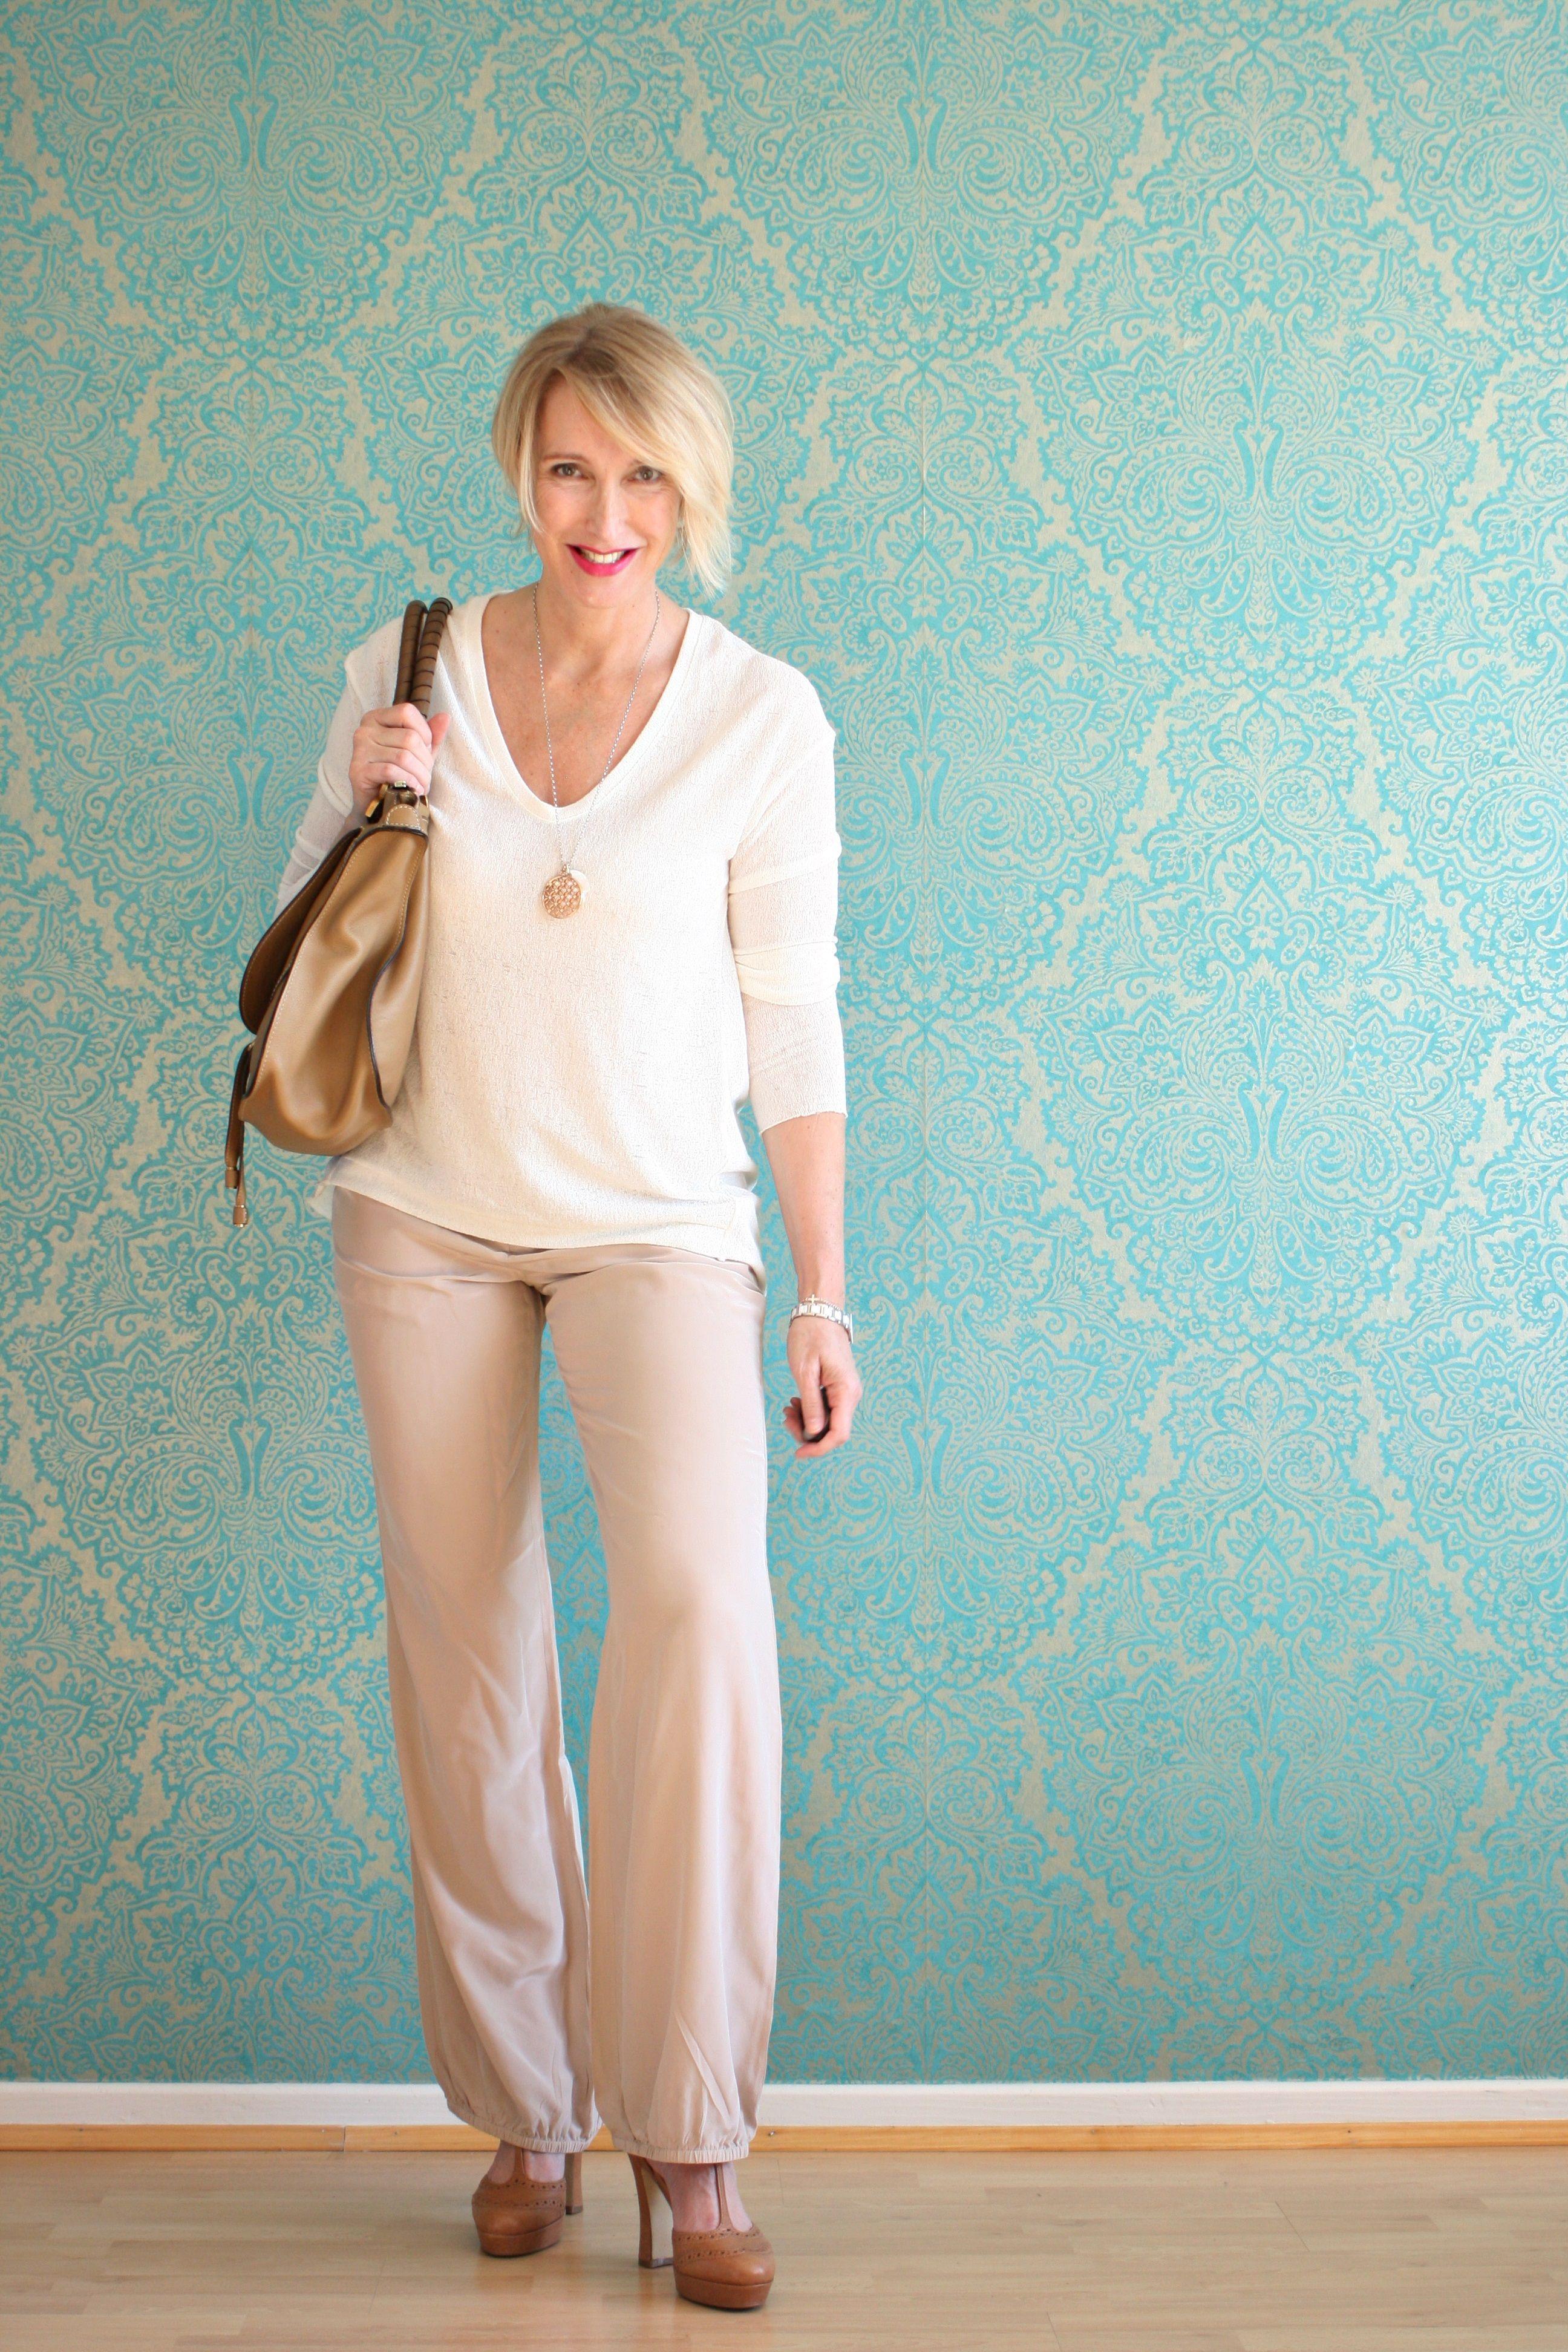 A fashion blog for women over 40 and mature women http://www.glamupyourlifestyle.com/  Sweater: Zara Pants: Dorothee Schumacher Shoes: Laura by Görtz  Bag: Chloé